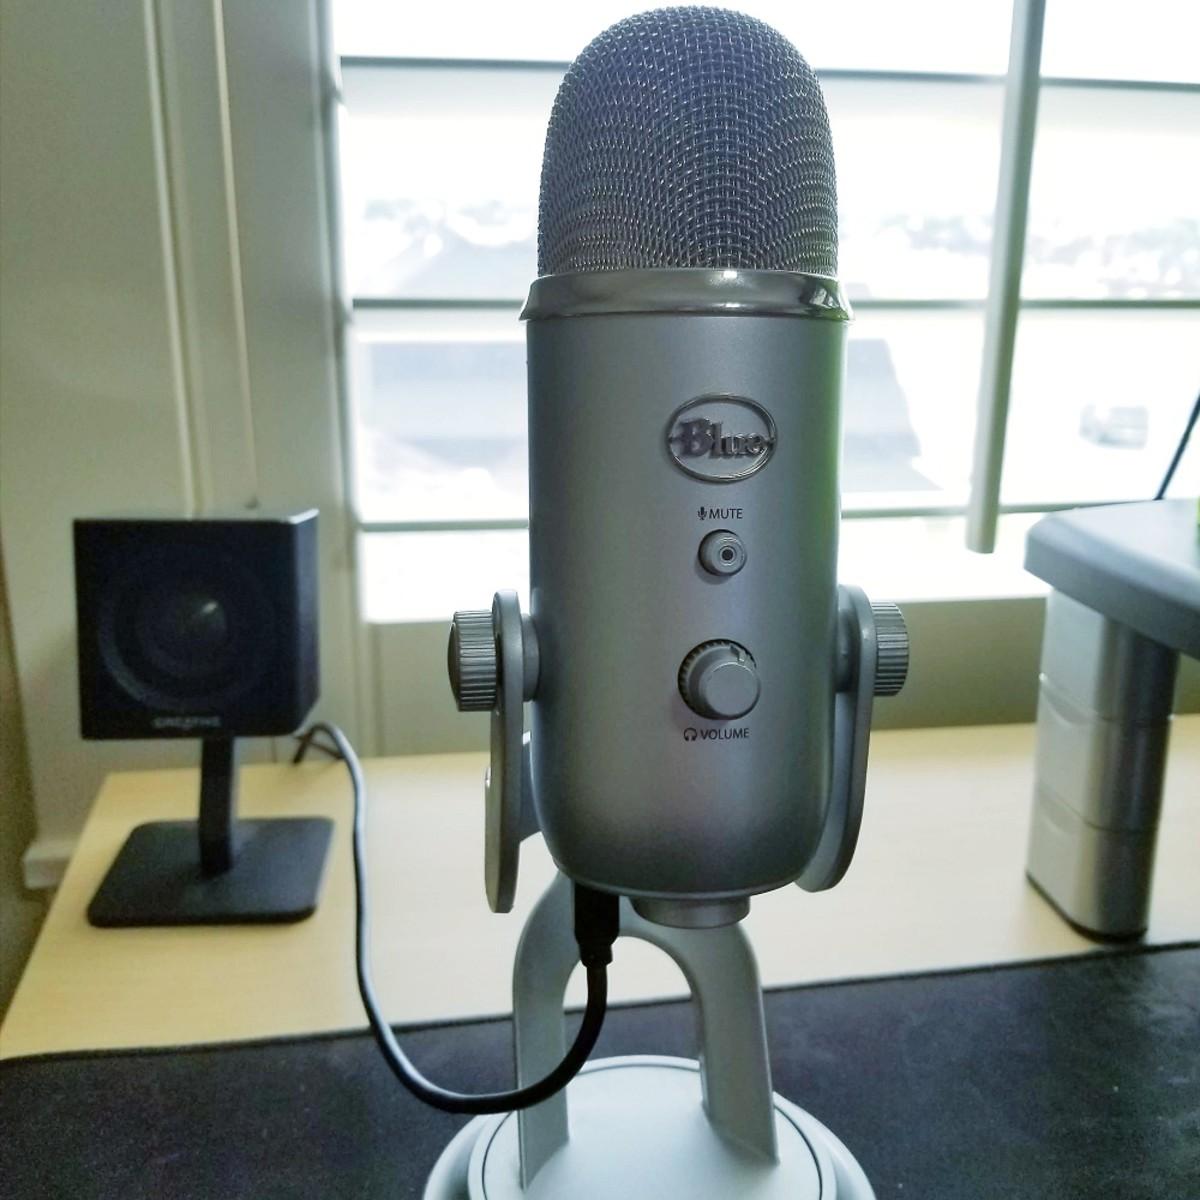 8 best budget microphones for youtube 2019 turbofuture. Black Bedroom Furniture Sets. Home Design Ideas